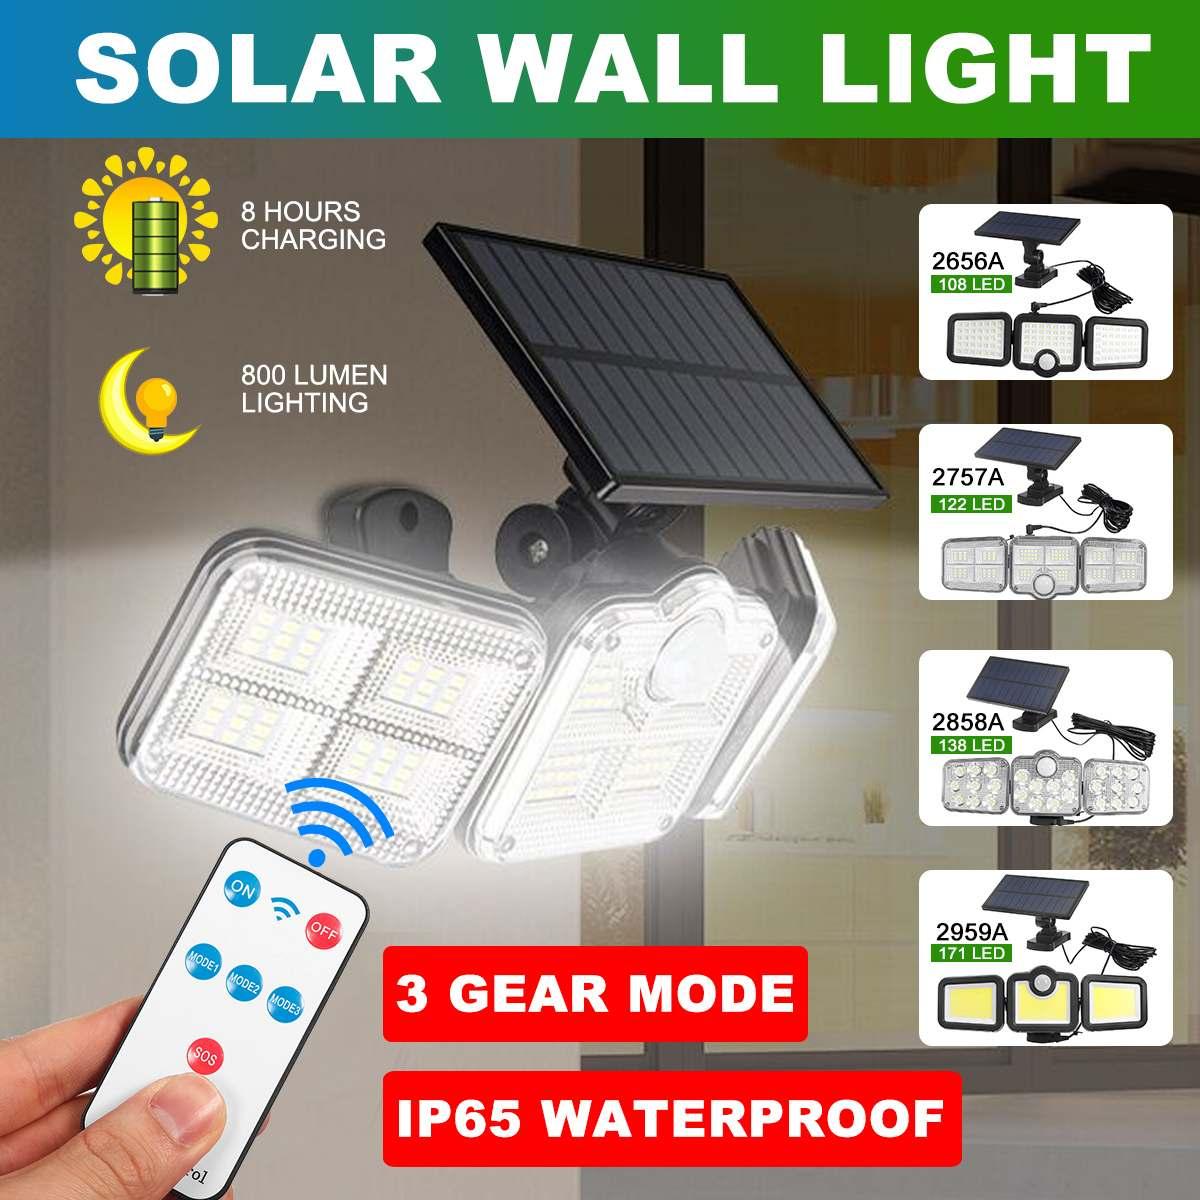 171/138/122/108 LED Wireless Led Solar Motion Sensor Lights Outdoor 3 Heads 270 IP65 Solar Security Lights for Front Door Yard